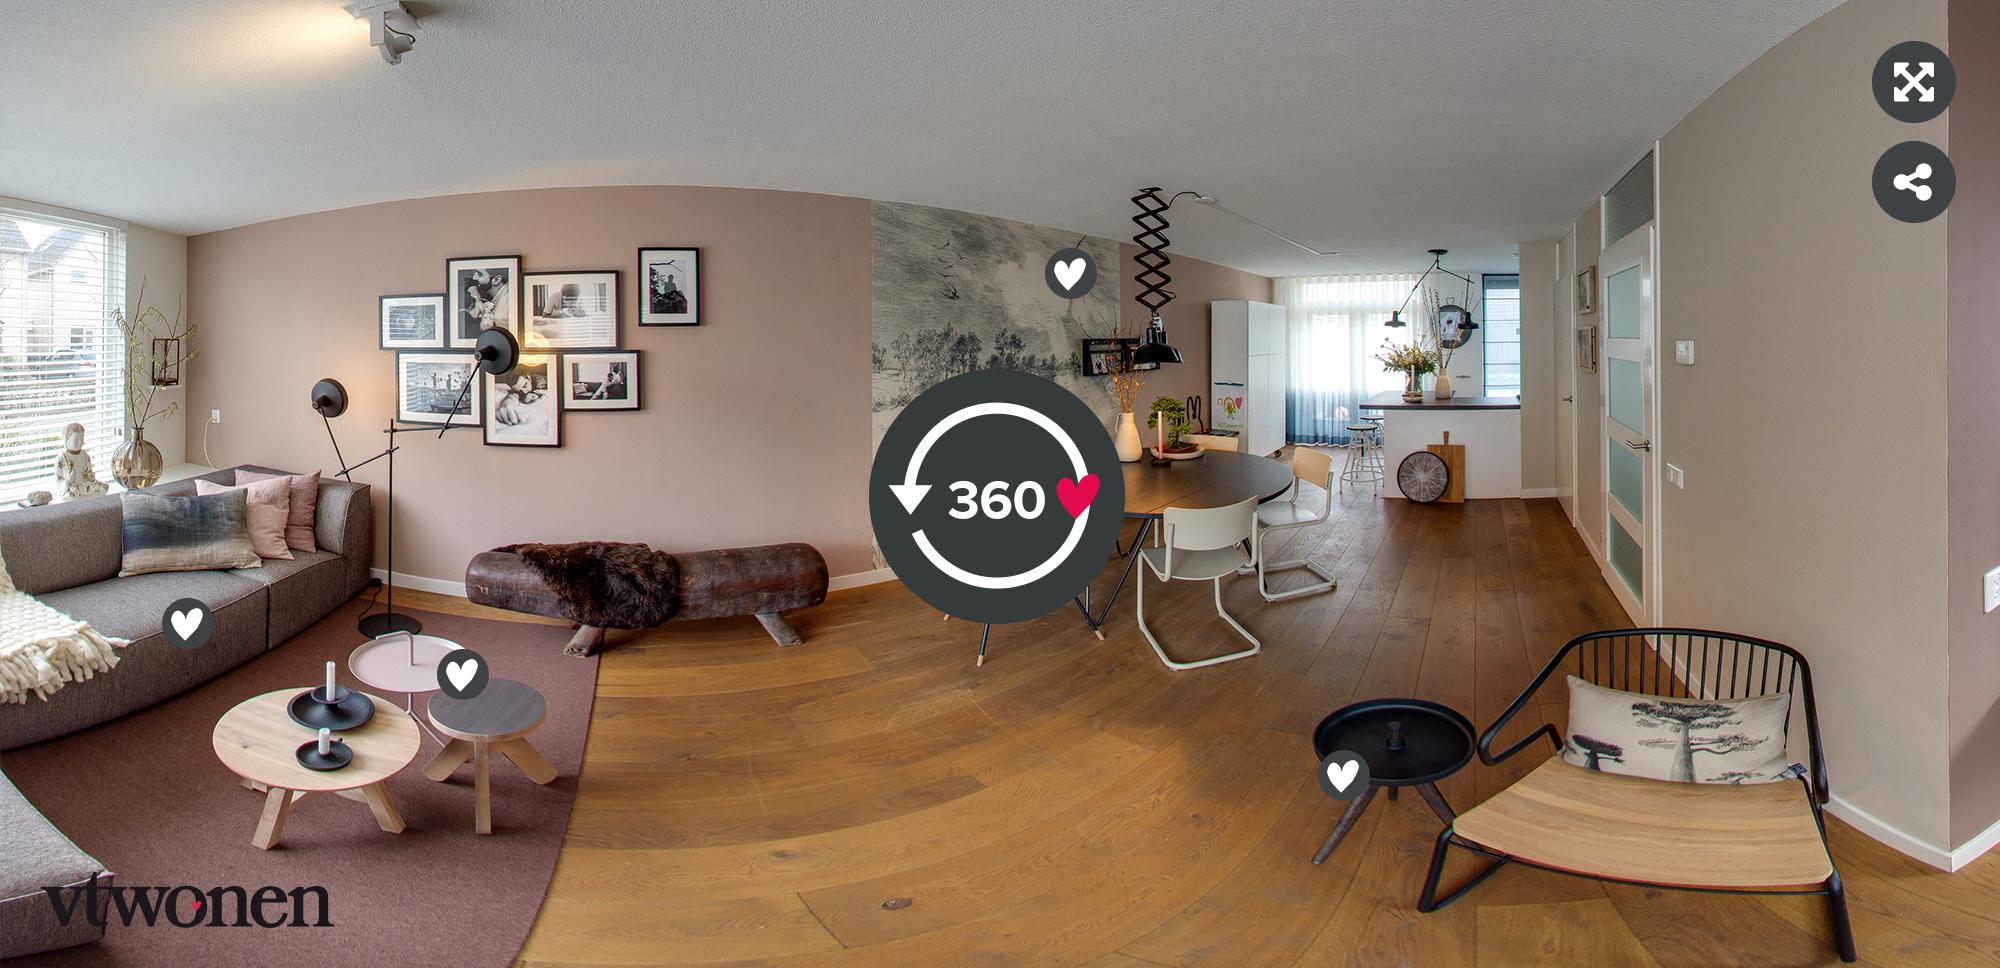 360 graden tour